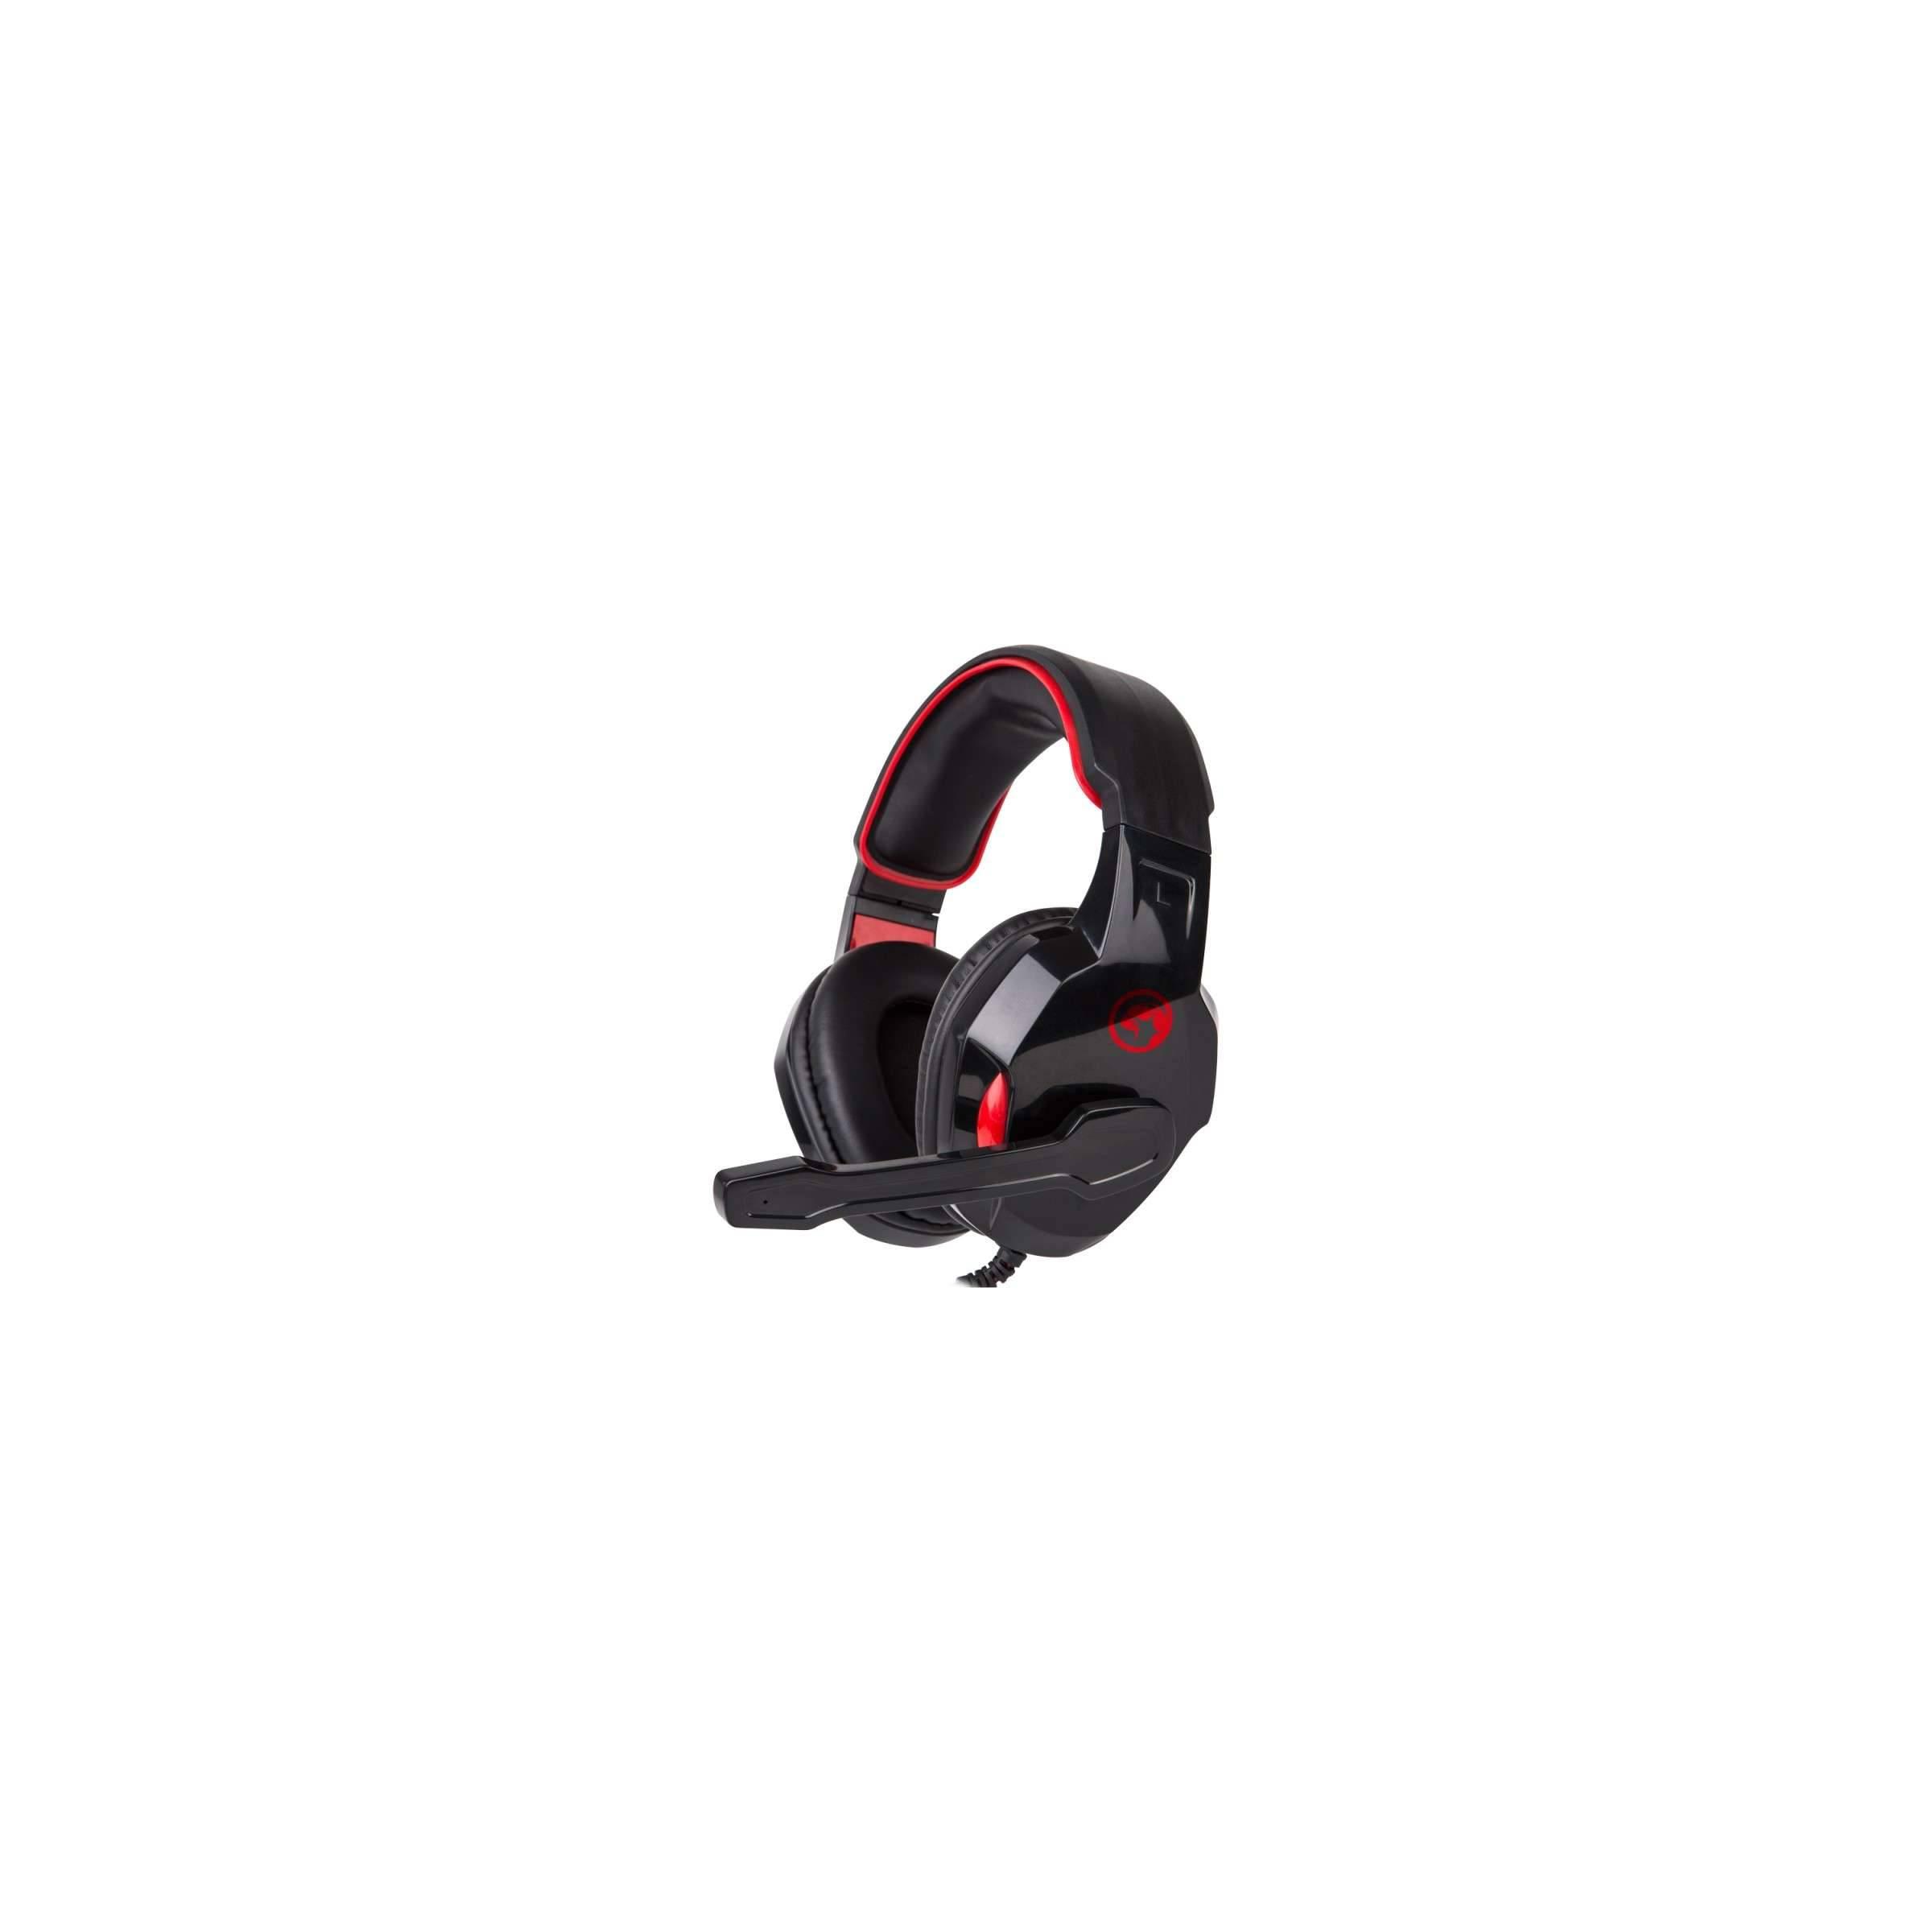 scorpion by marvo – Scorpion hg8802 gaming headset sort og rød med mic fra mackabler.dk